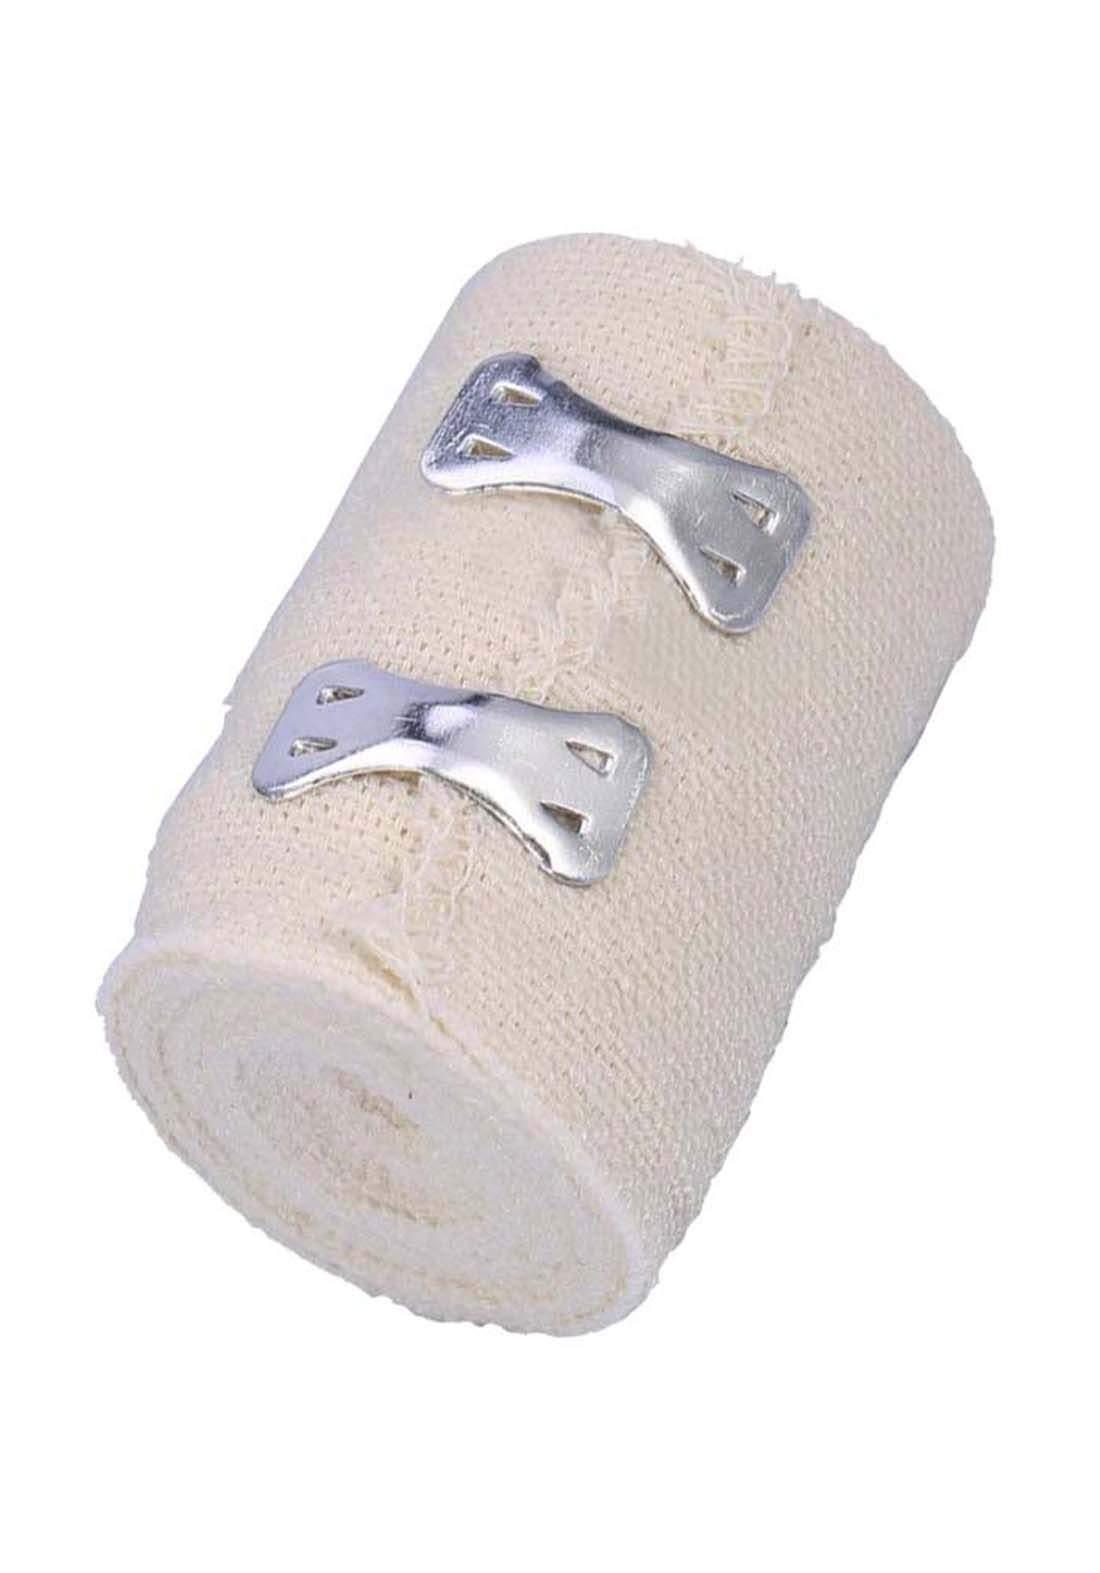 Optimal  Non sterile elastic bandage 7.5cm*4.5m   ضمادات طبية مطاطة بمشبك معدني